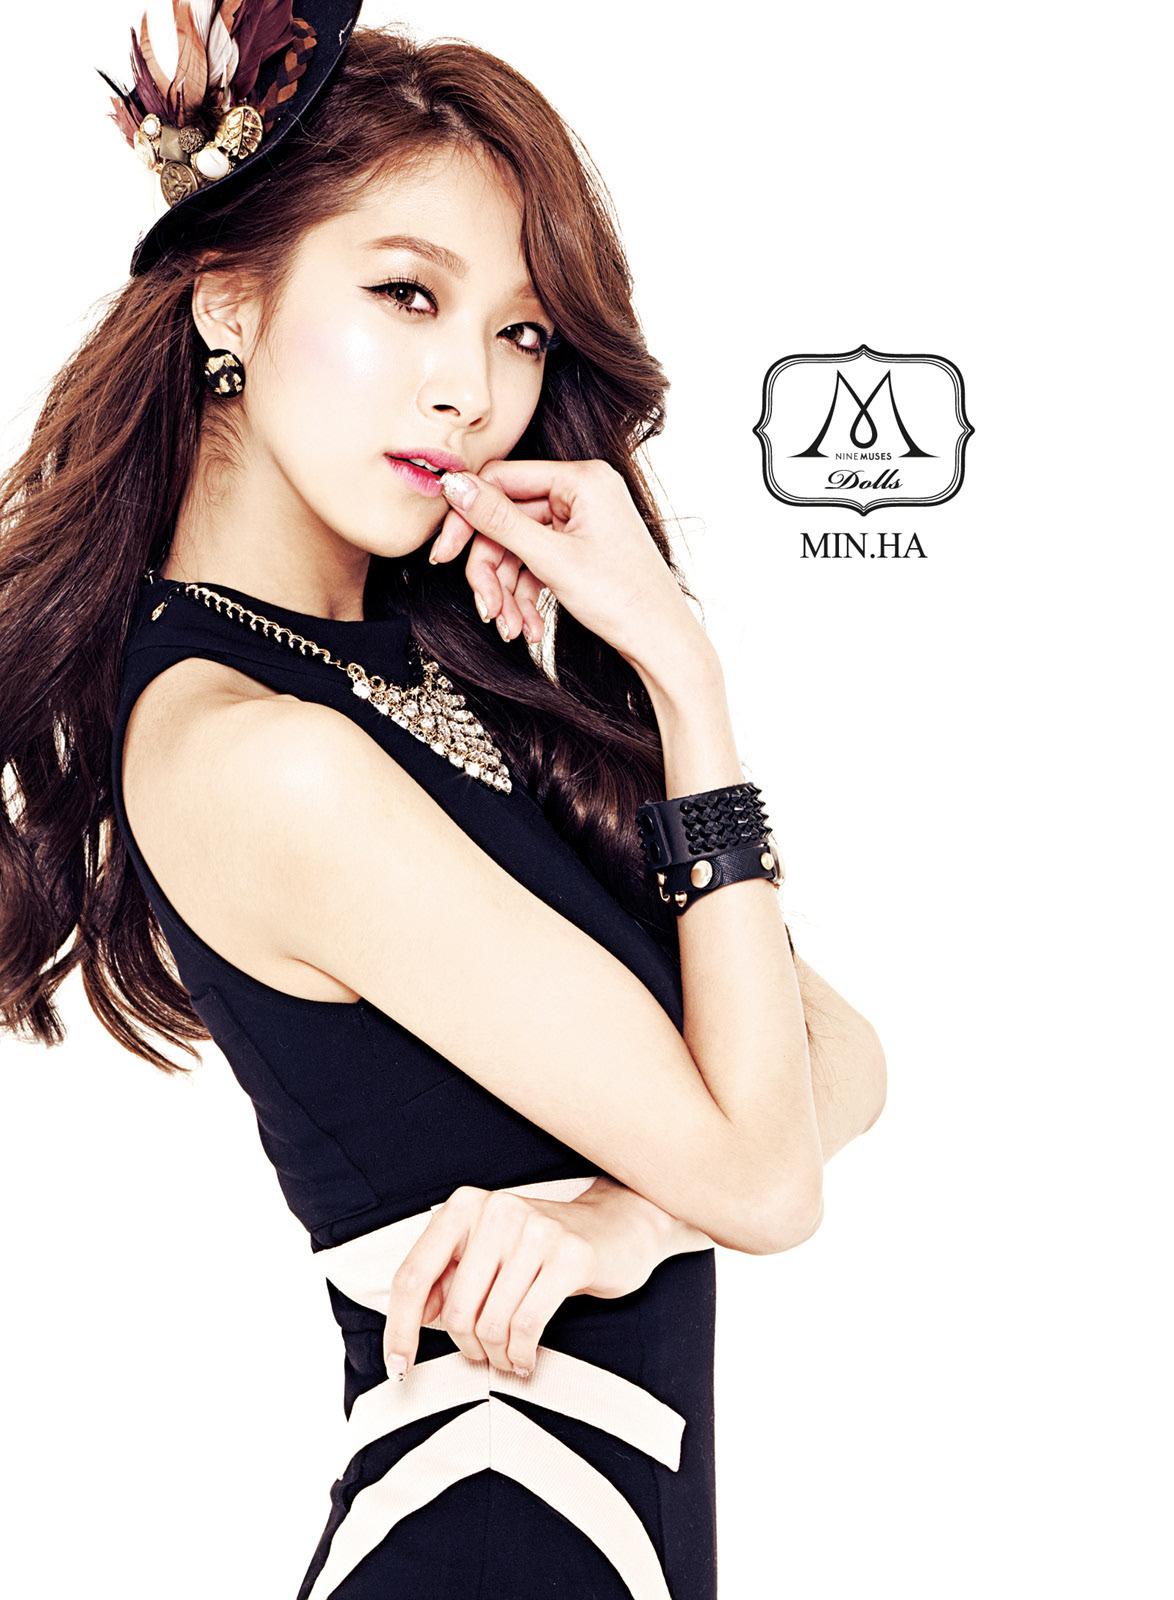 Park Minha Android/iPhone Wallpaper #22682 - Asiachan KPOP